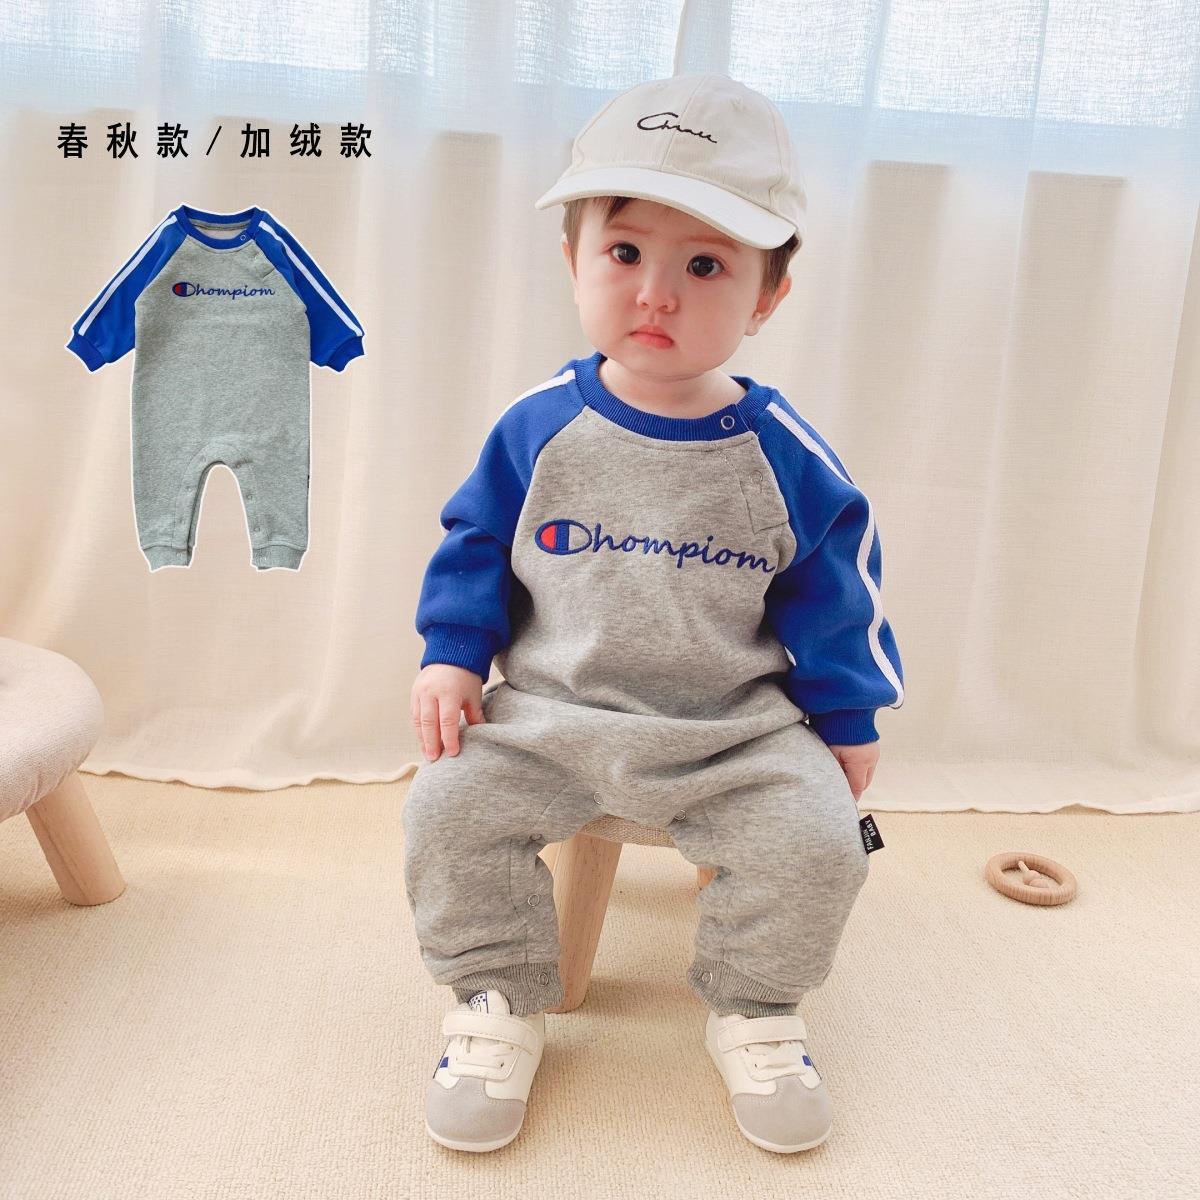 Baby plush girls Jumpsuit winter boys Khaki childrens creeping suit embroidery childrens Jumpsuit fashion